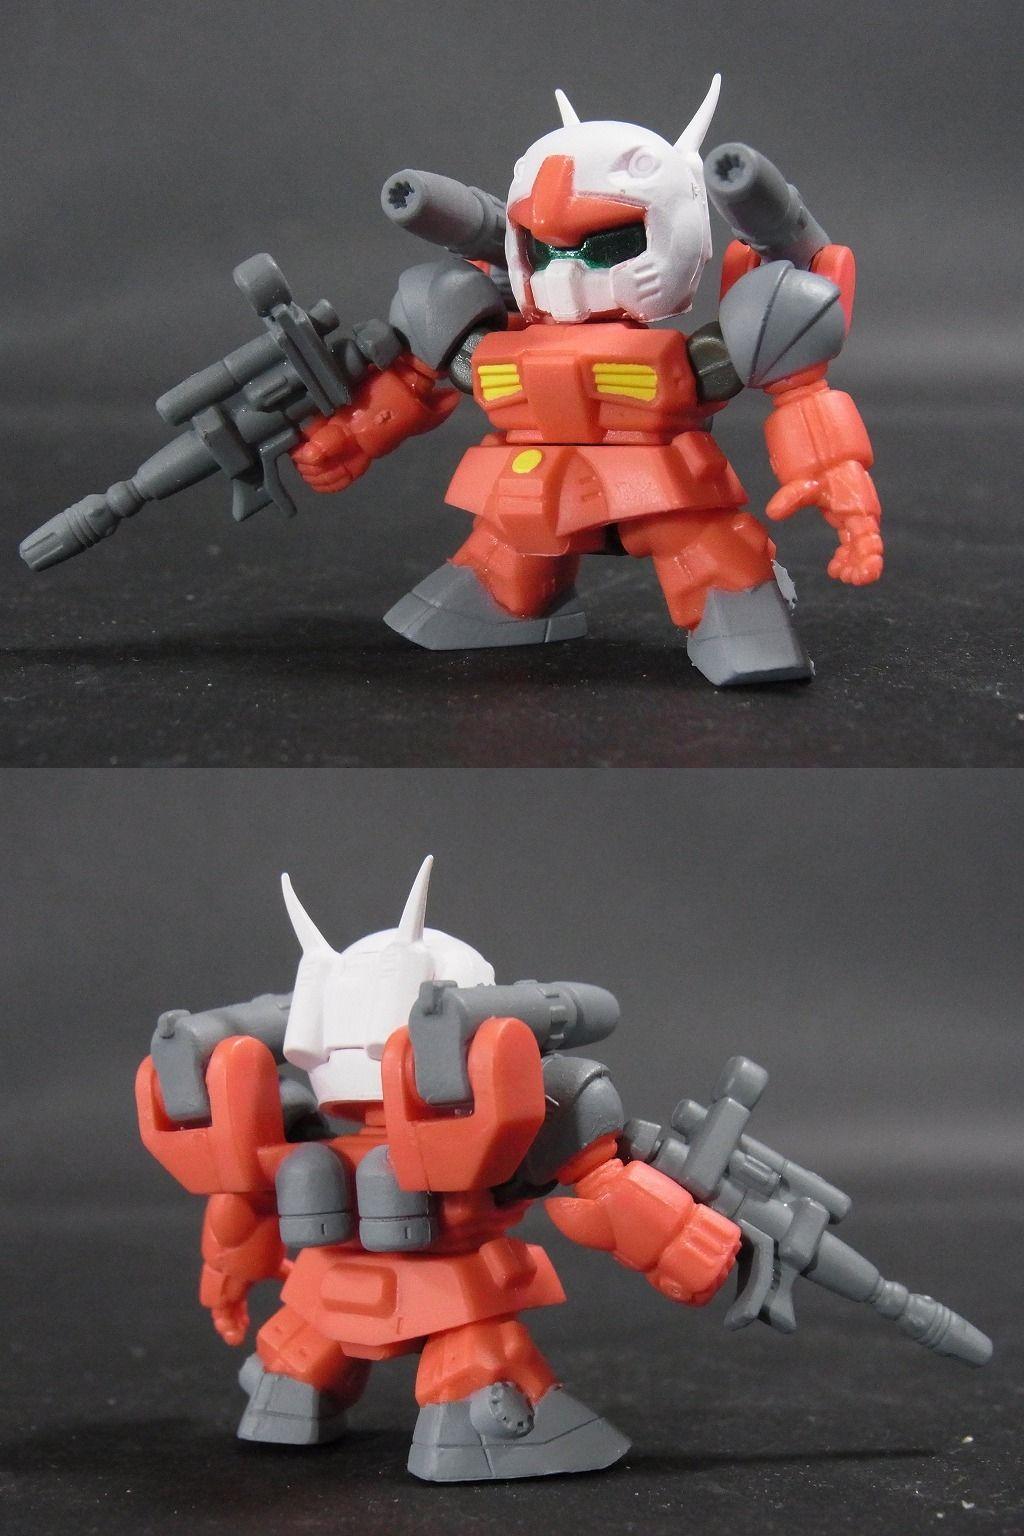 RX-77-2